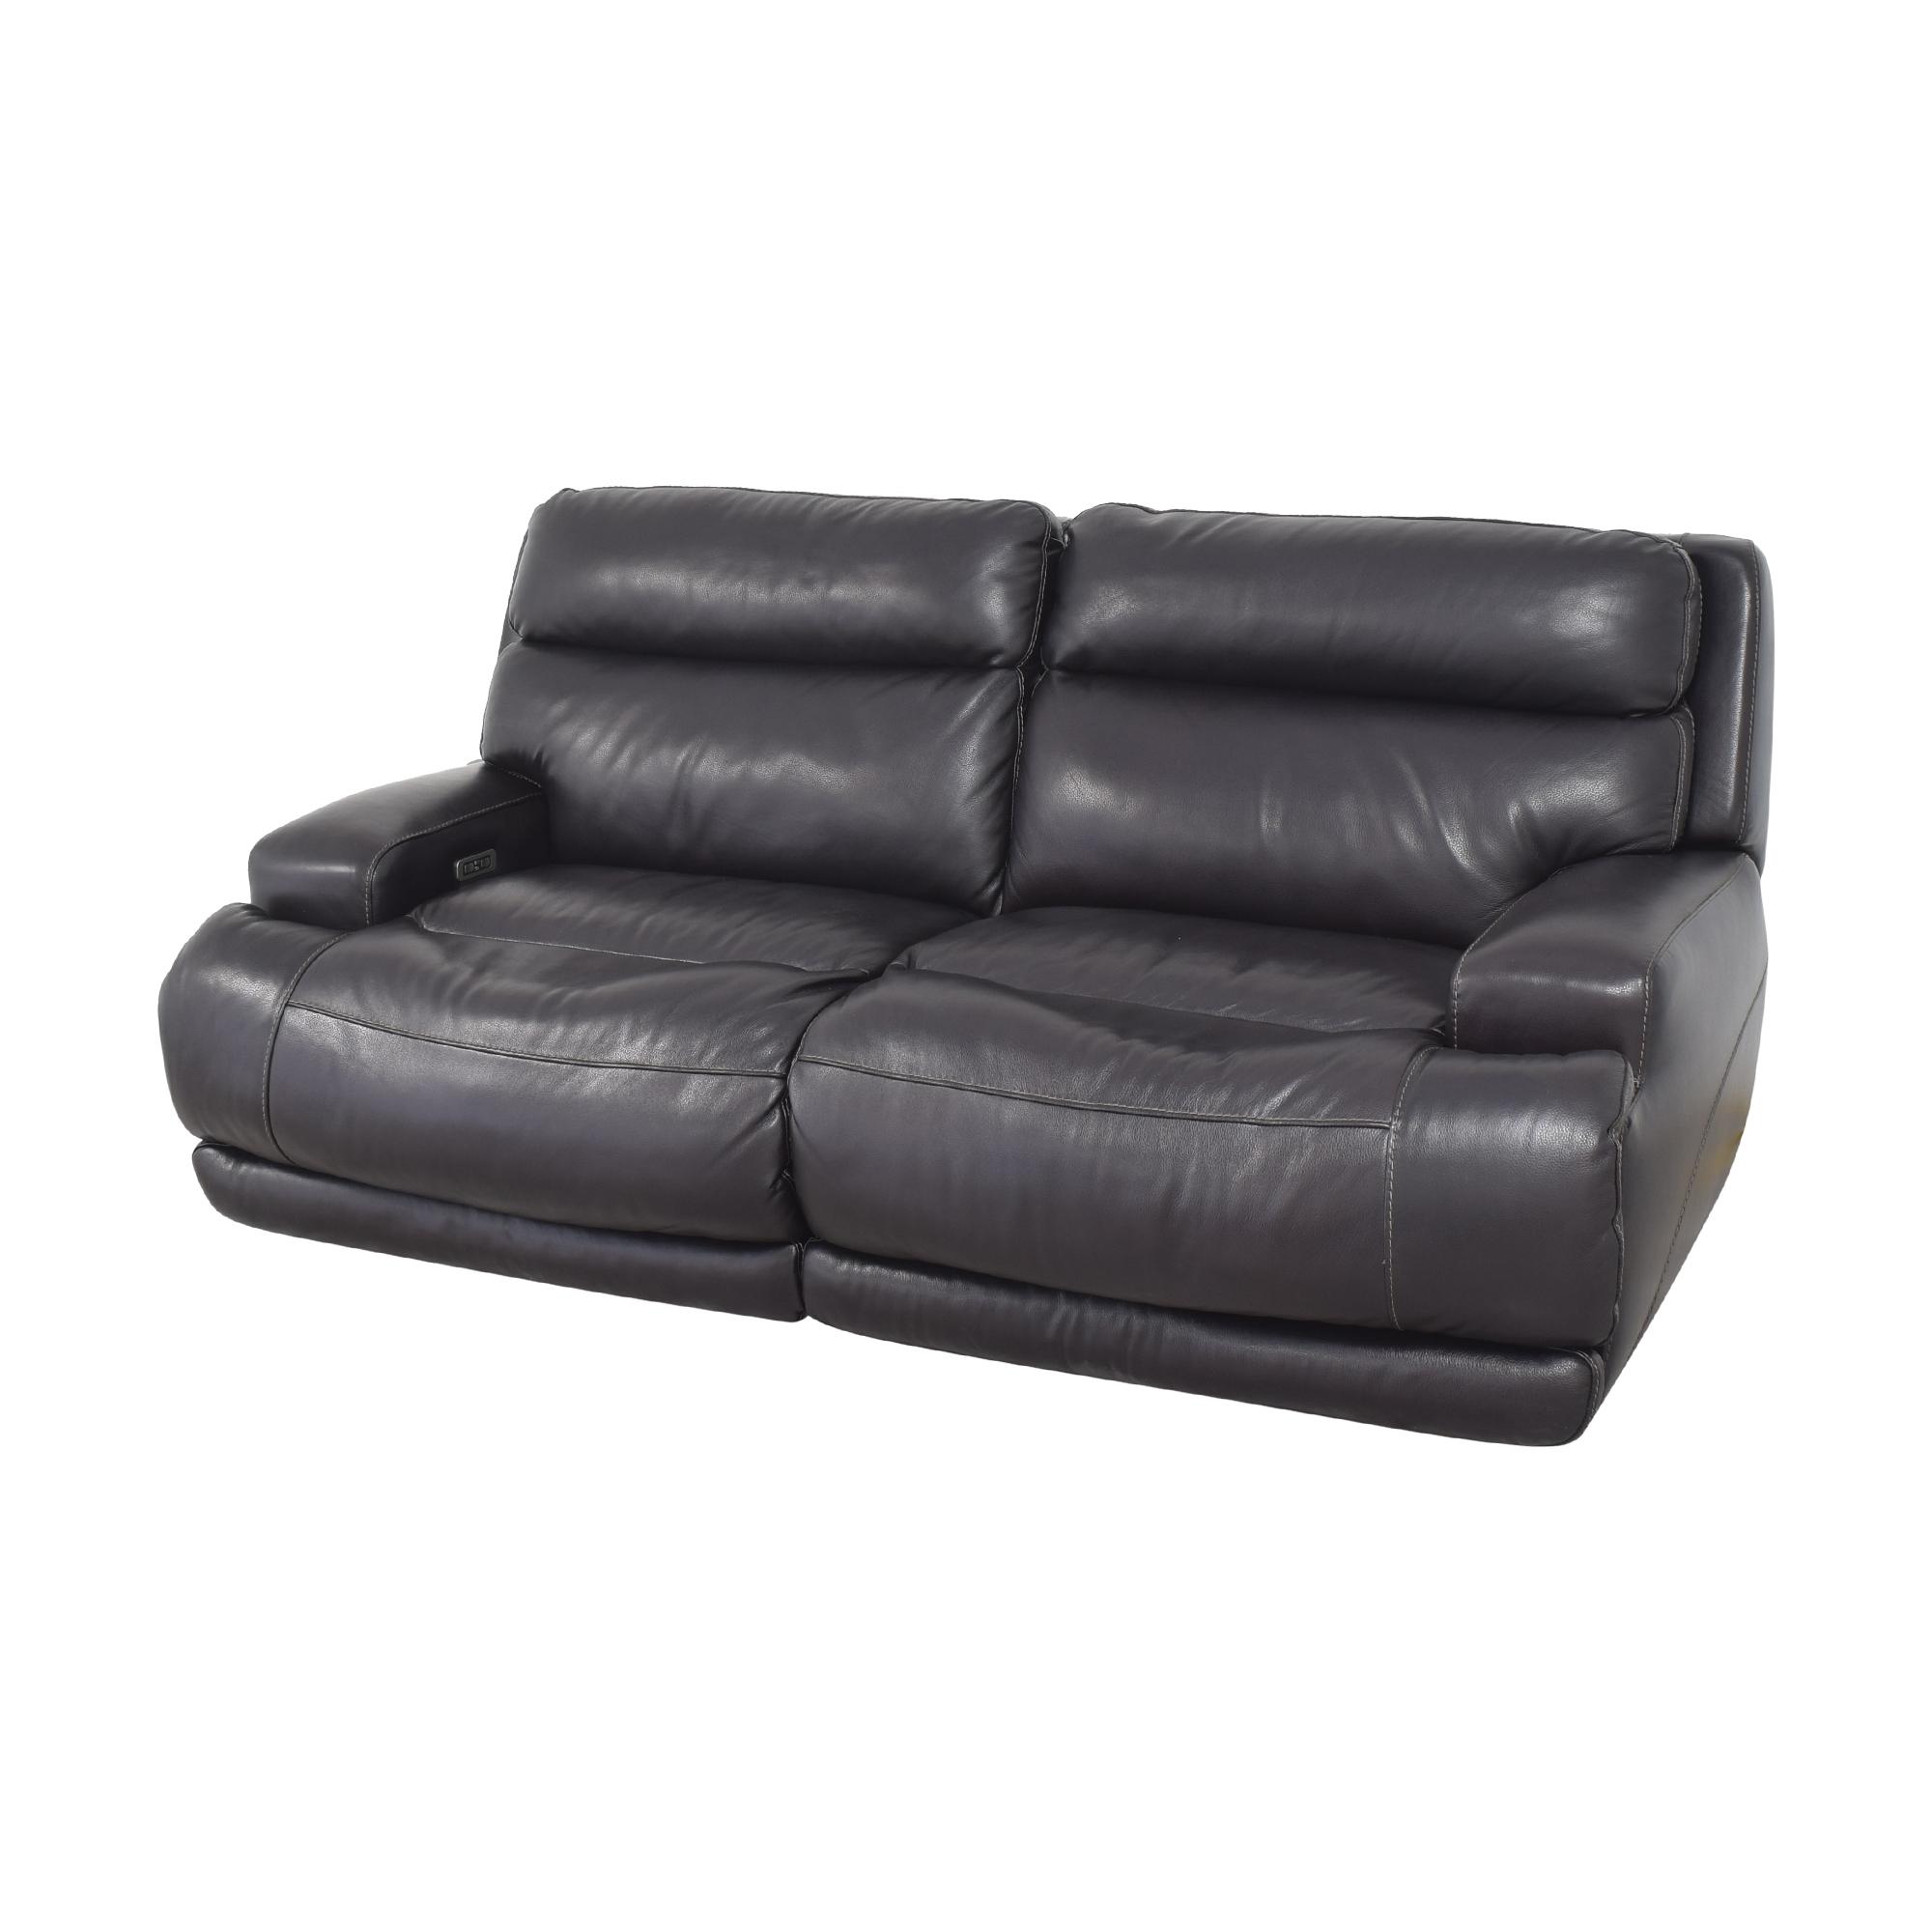 Raymour & Flanigan Tompkins Power Reclining Sofa / Classic Sofas